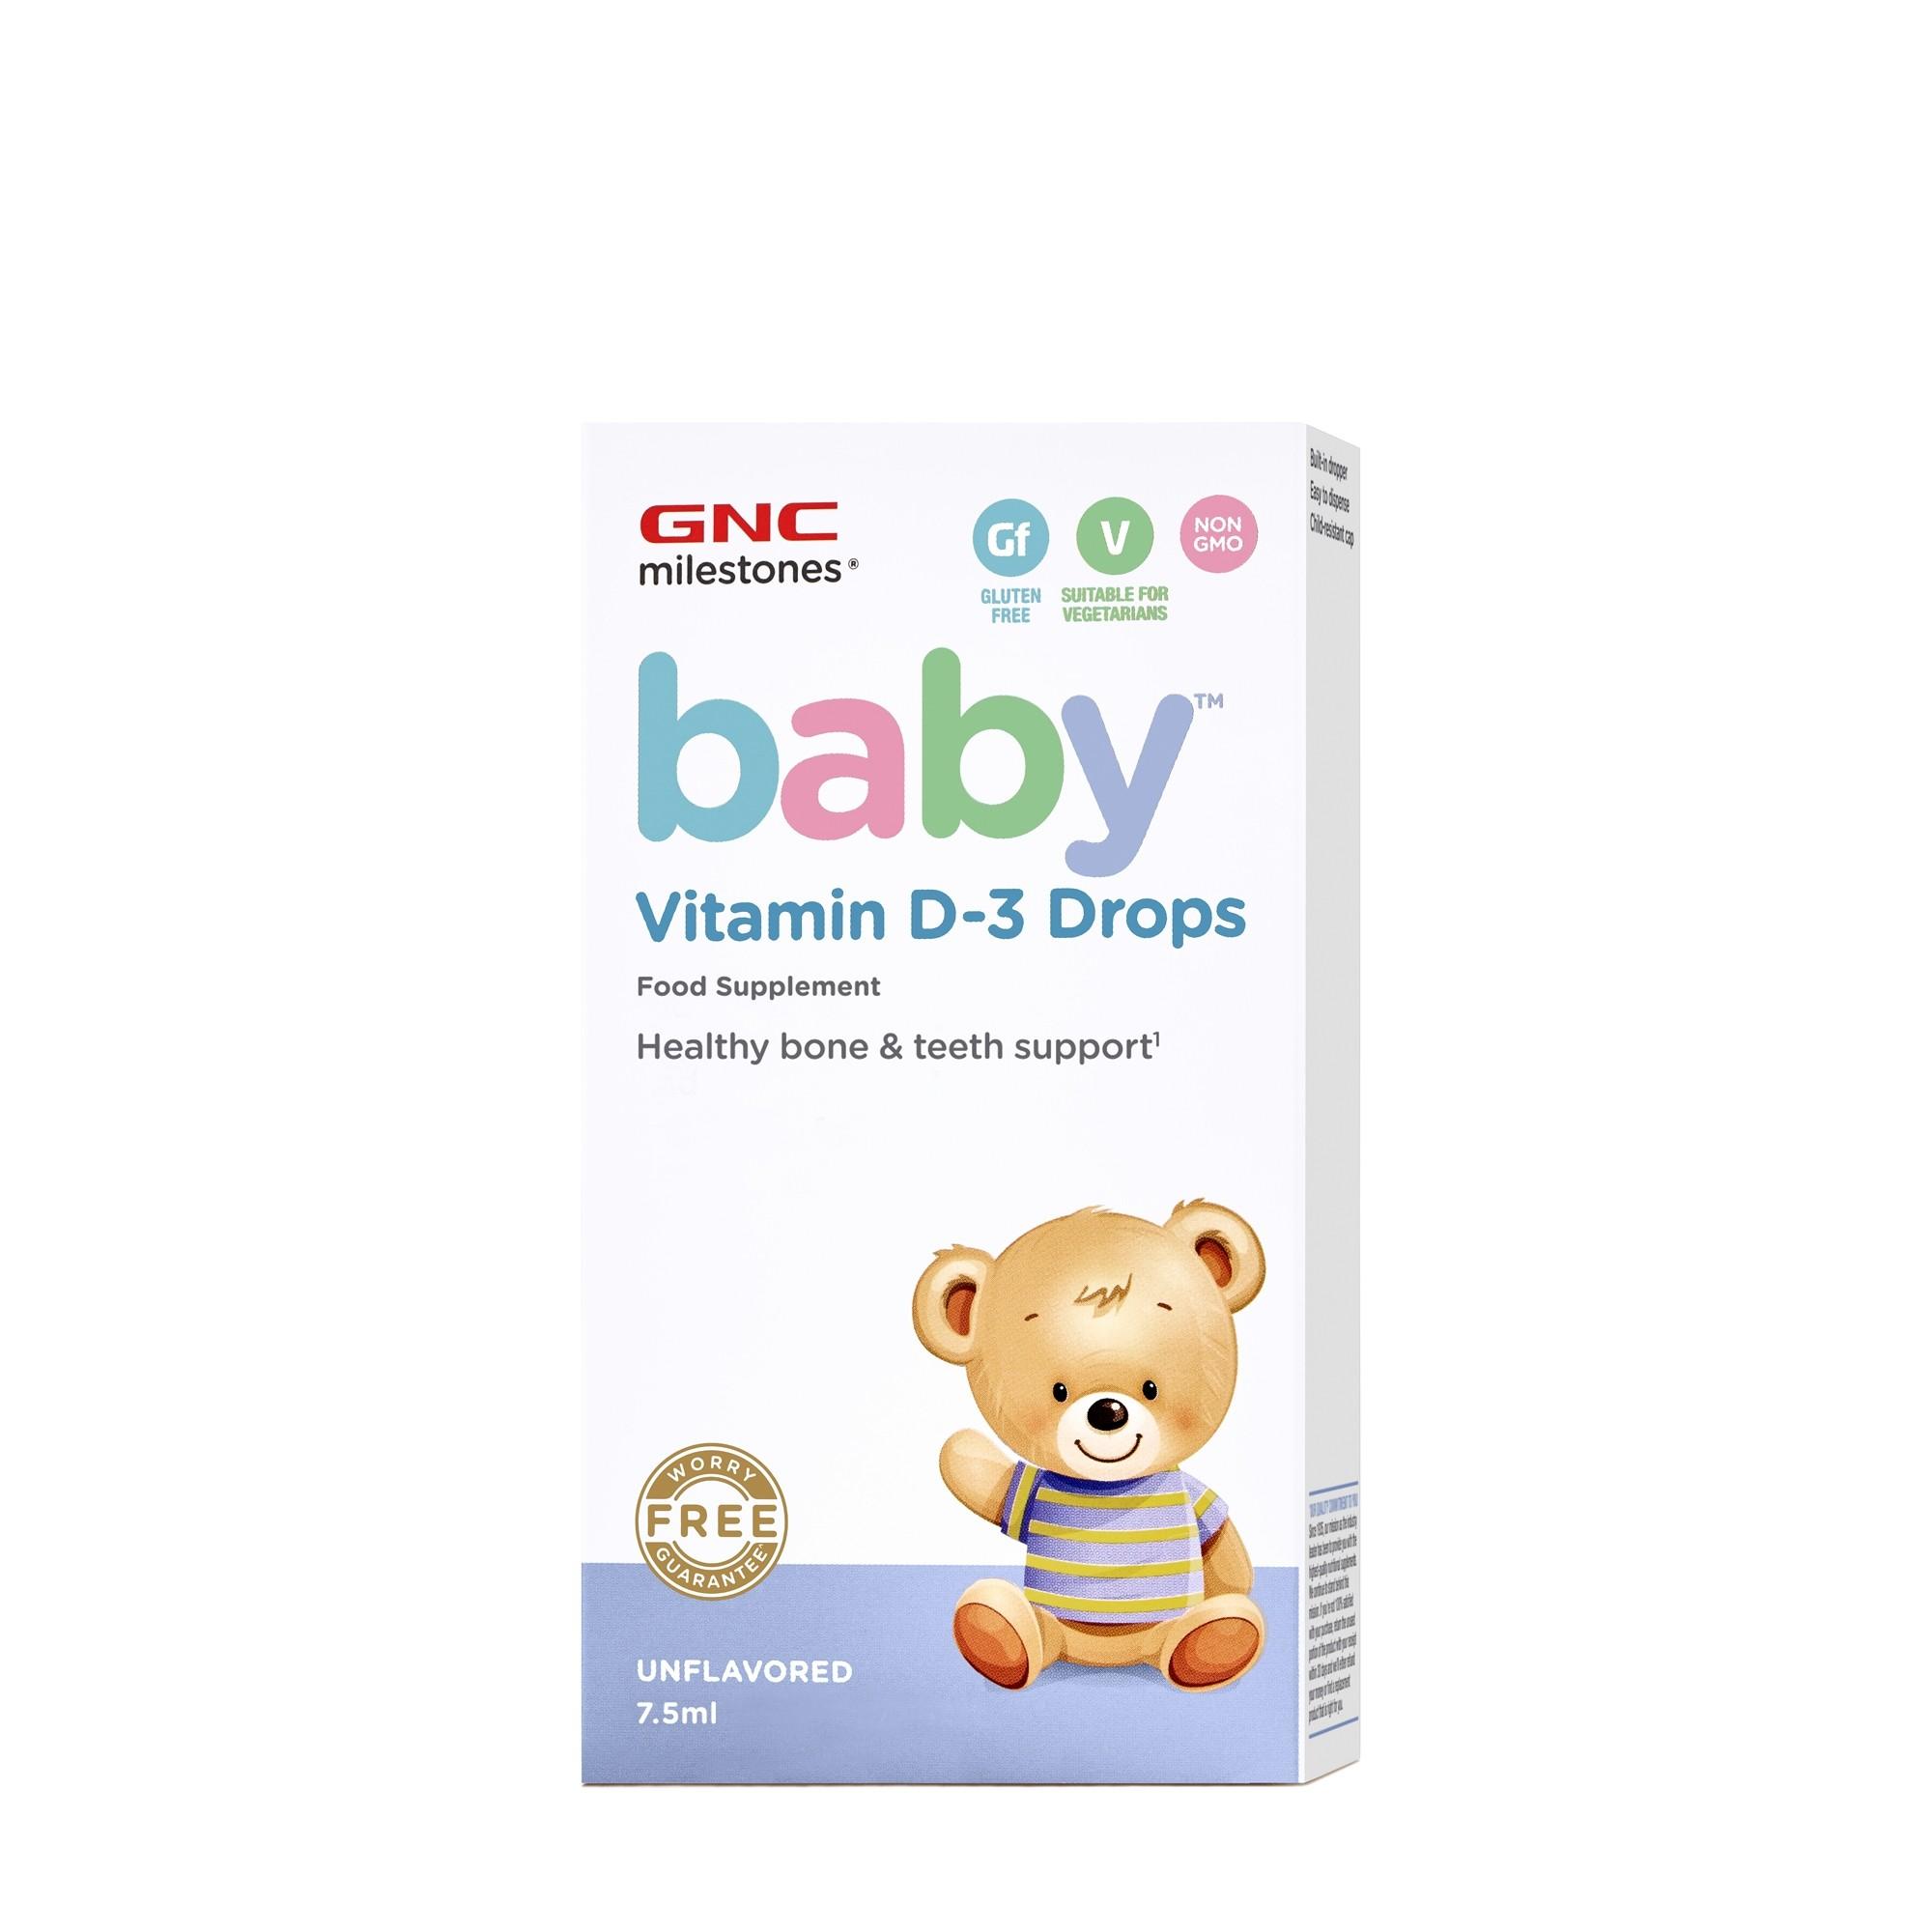 GNC Milestones® Baby™ Vitamin D-3 Drops, Vitamina D-3 Picaturi Pentru Bebelusi, 7.5 ml